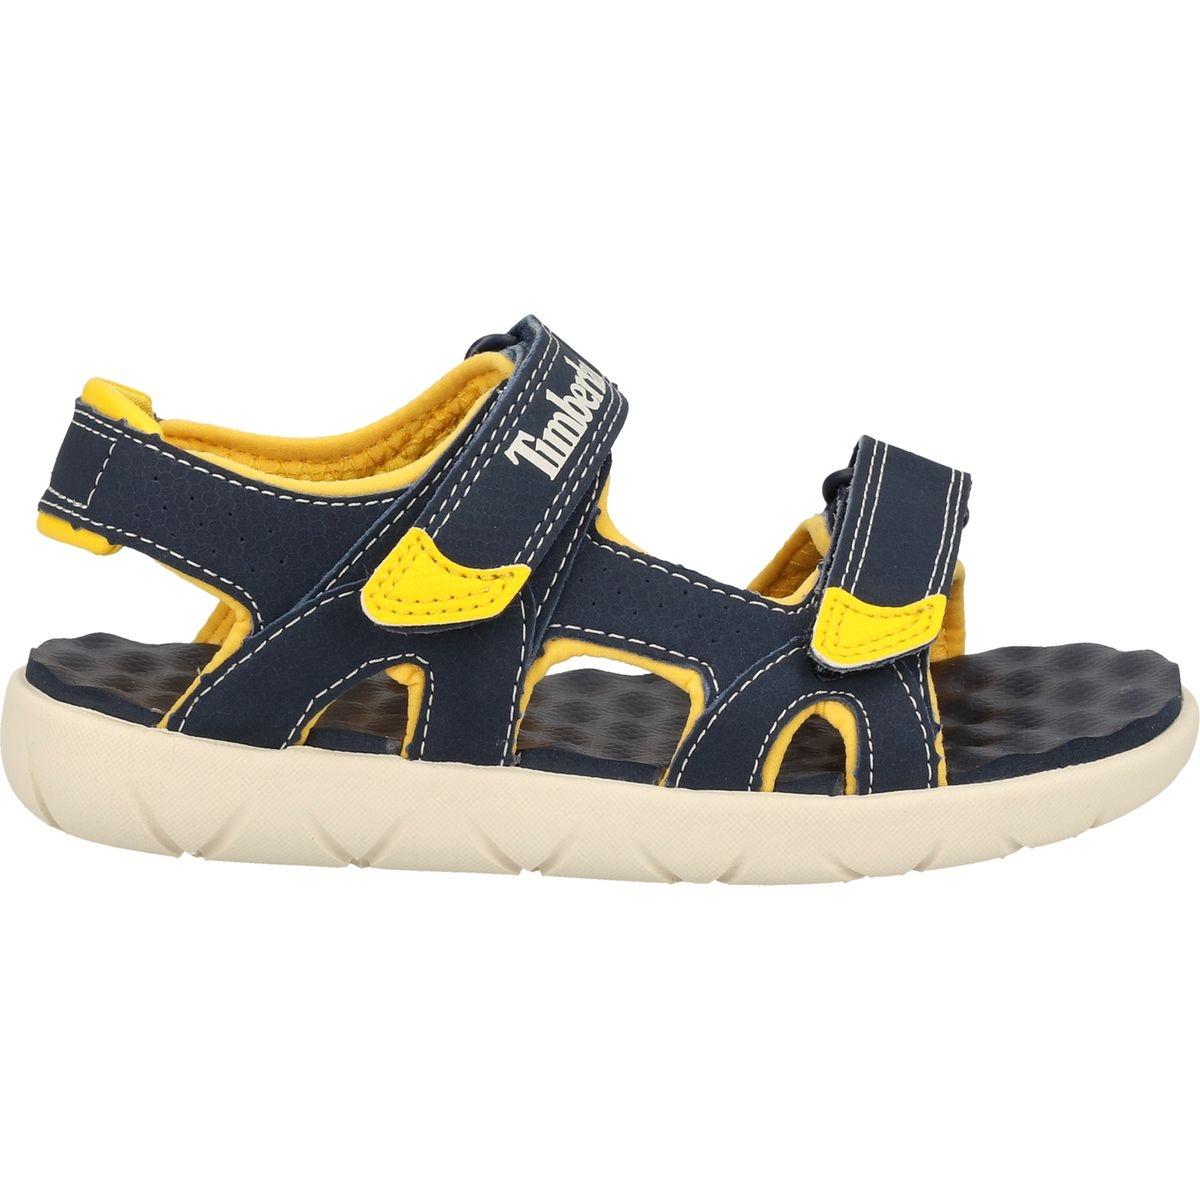 Sandales Imitation cuir